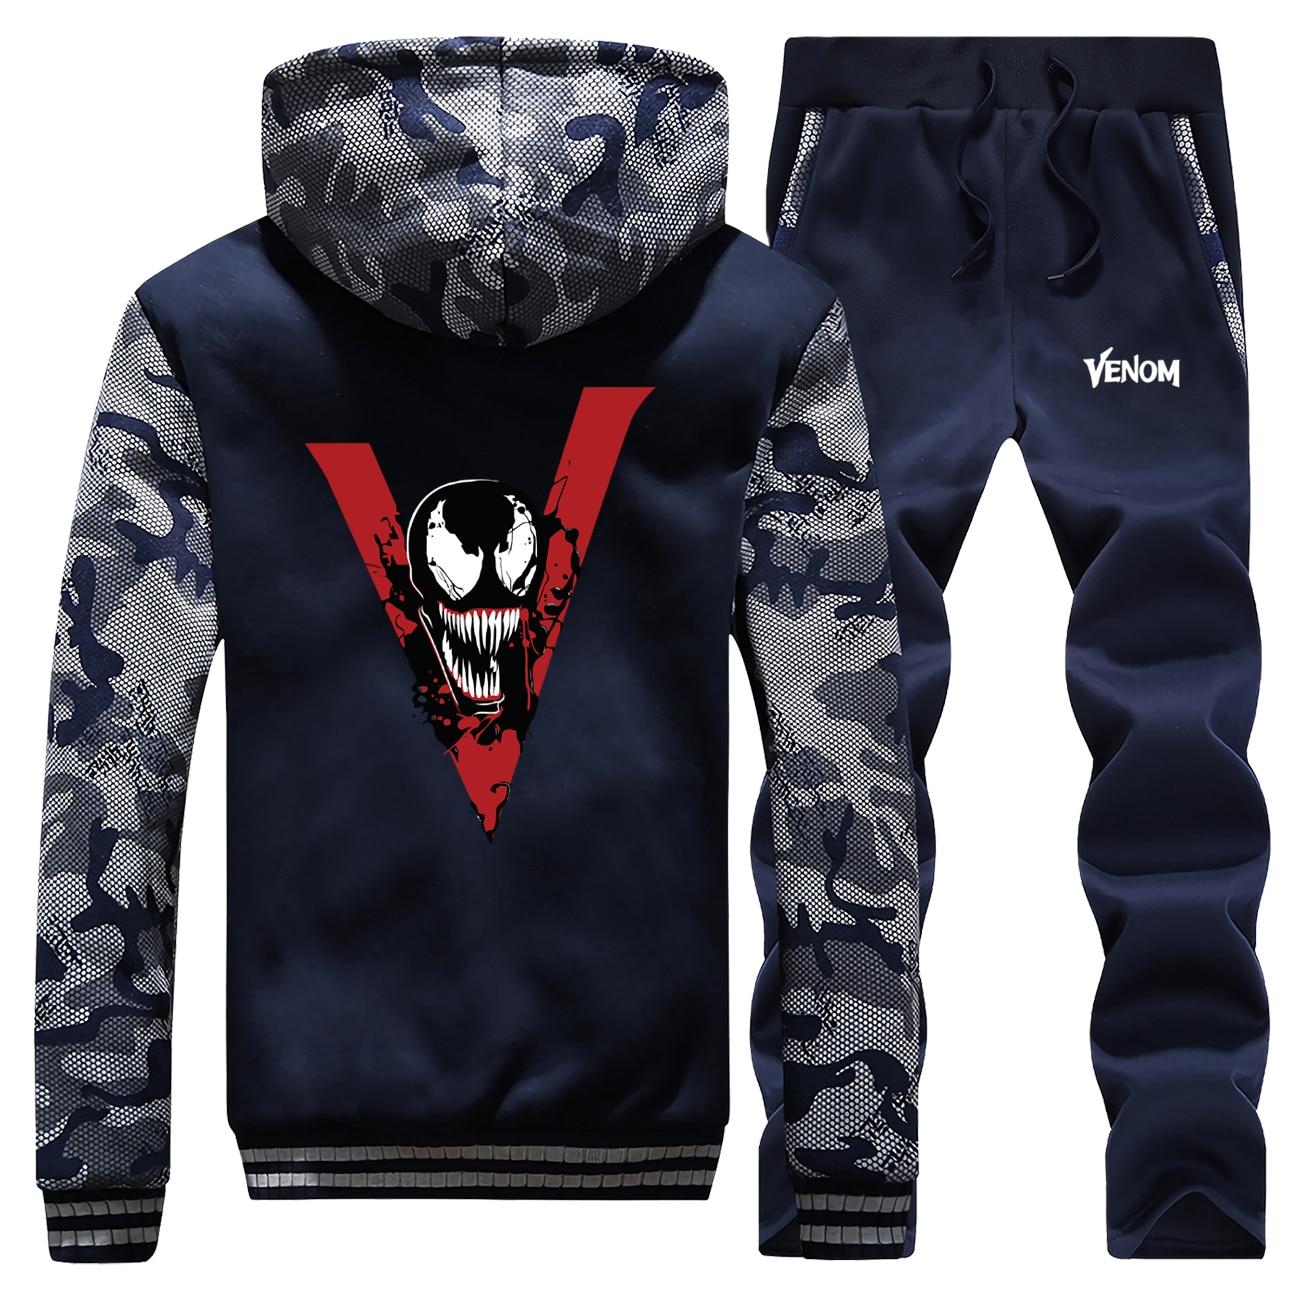 Hot Sale Winter Venom Cool Superhero Marvel Cartoon Mens Camouflage Sportswear Hoodies Coat Thick Suit Jackets+Pants 2 Piece Set